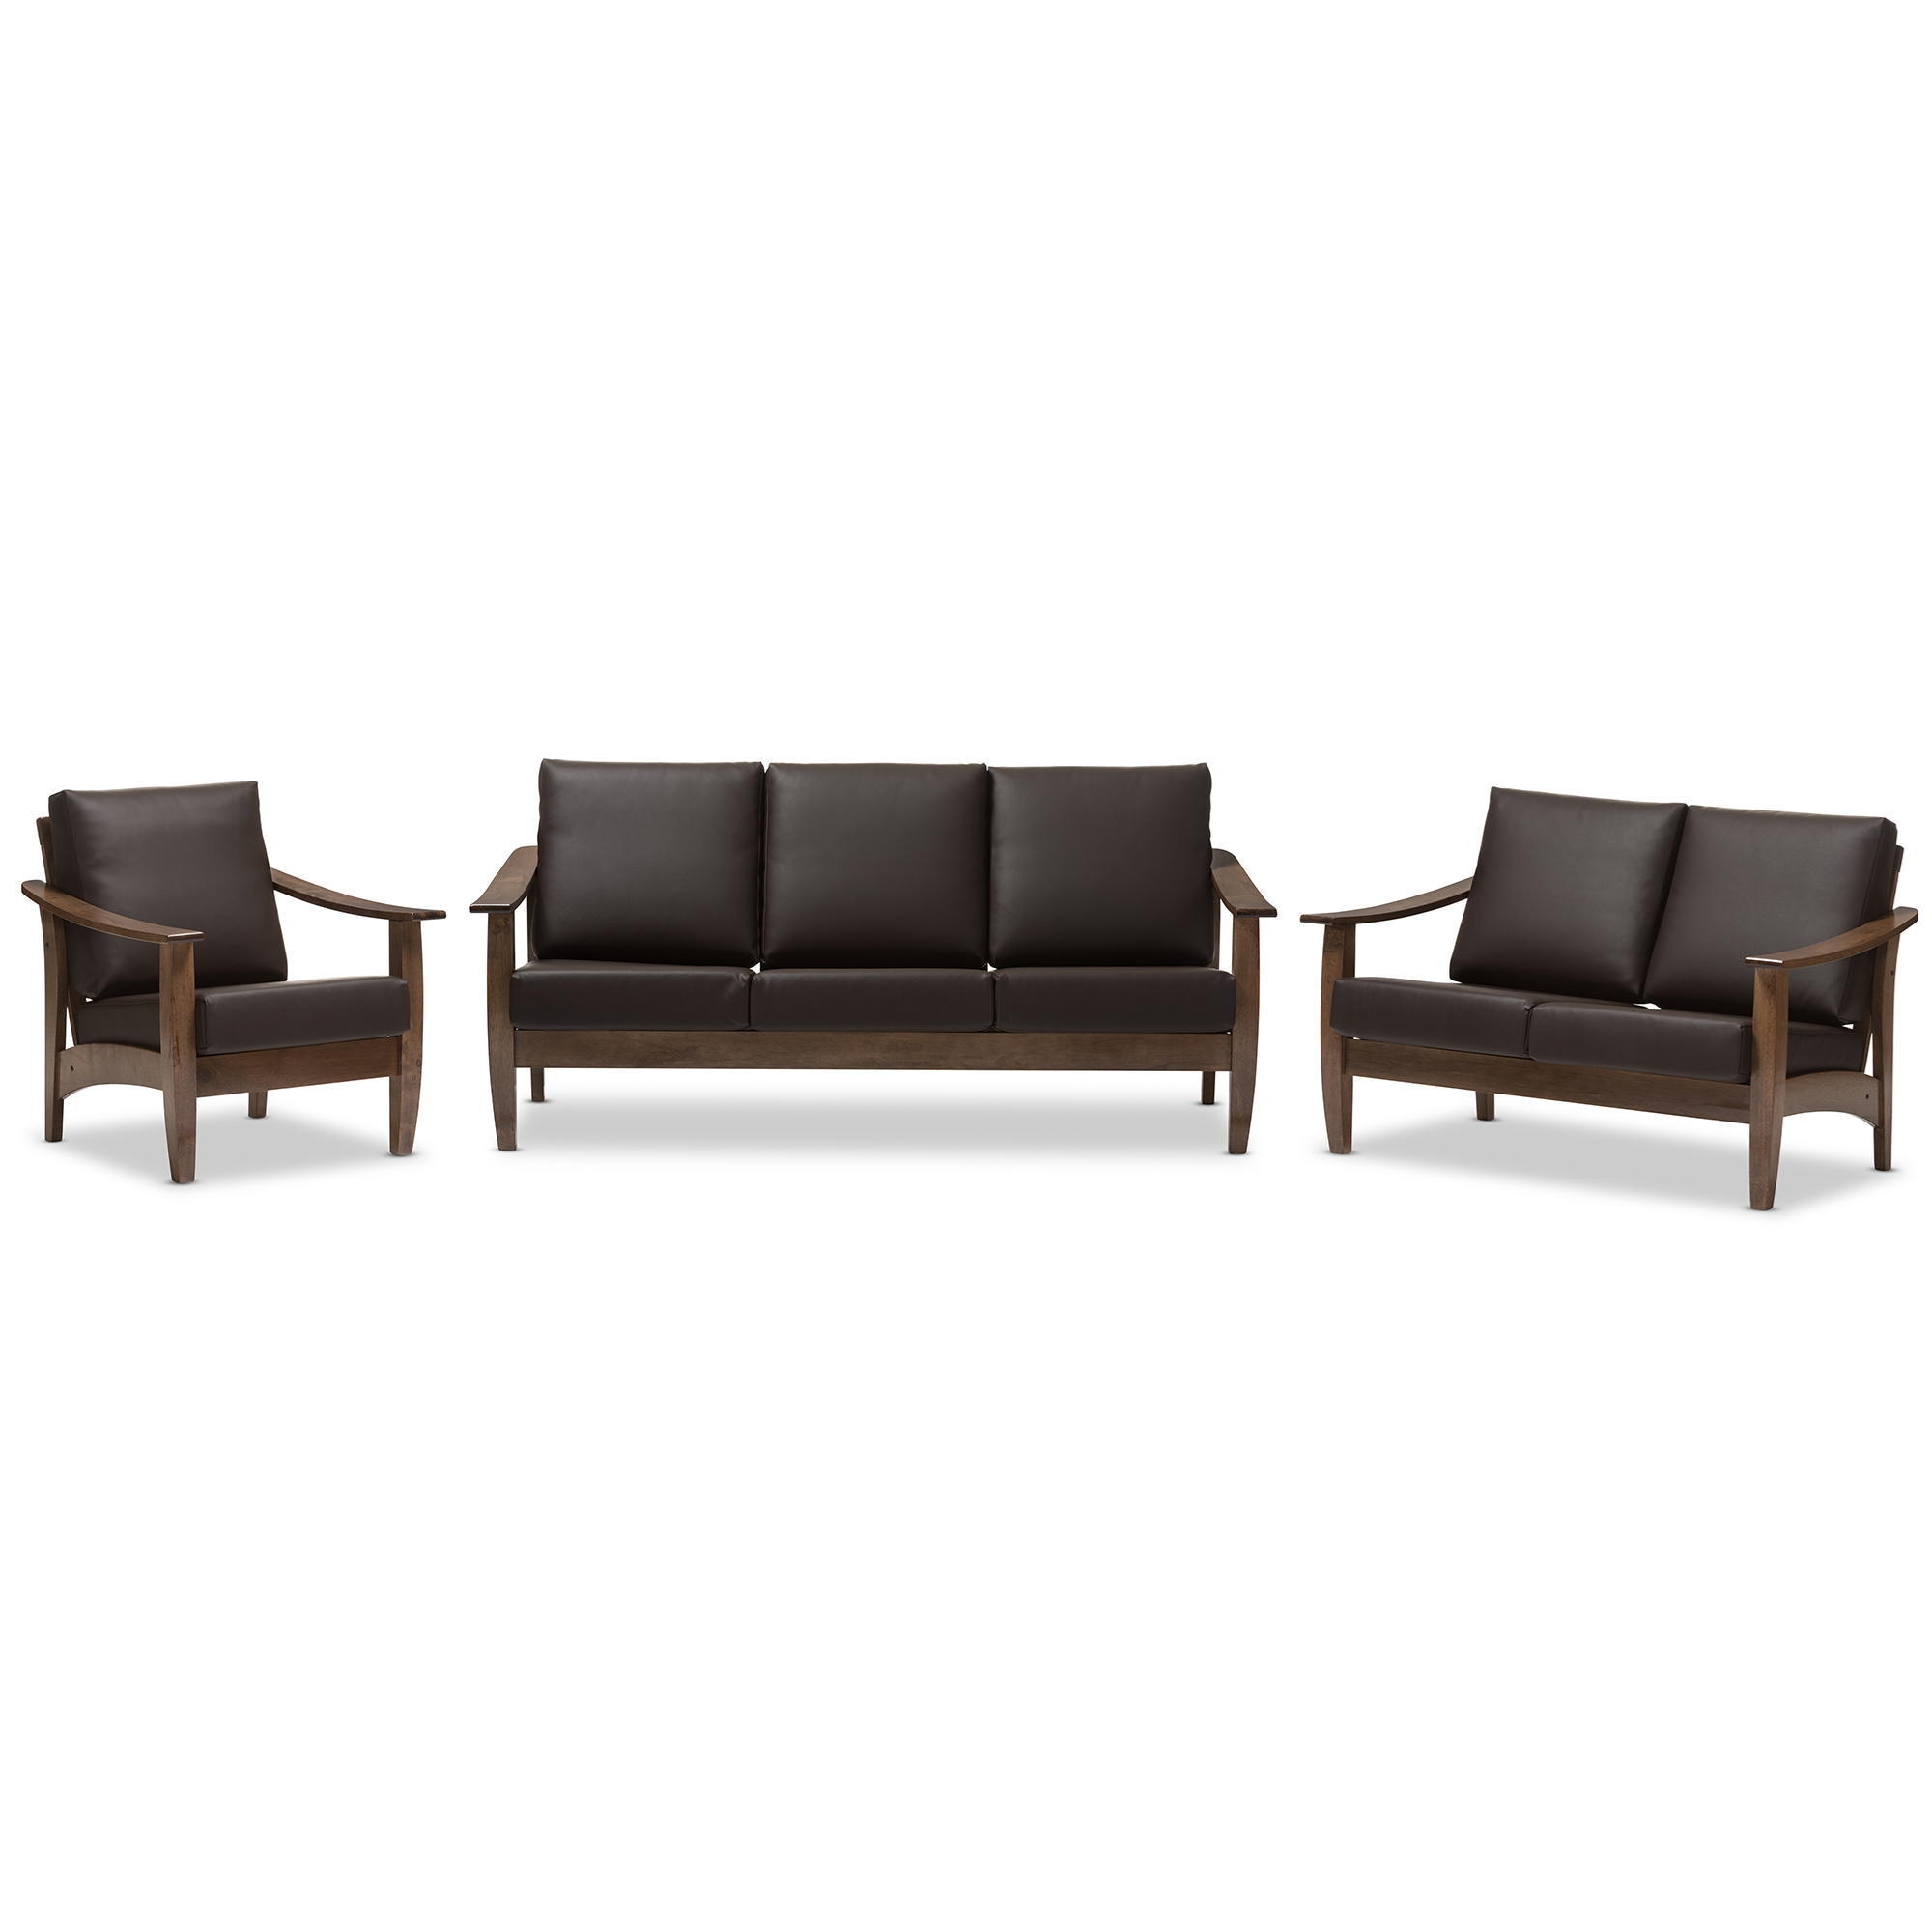 Modern Walnut Living Room Furniture baxton studio pierce mid-century modern walnut brown wood and dark